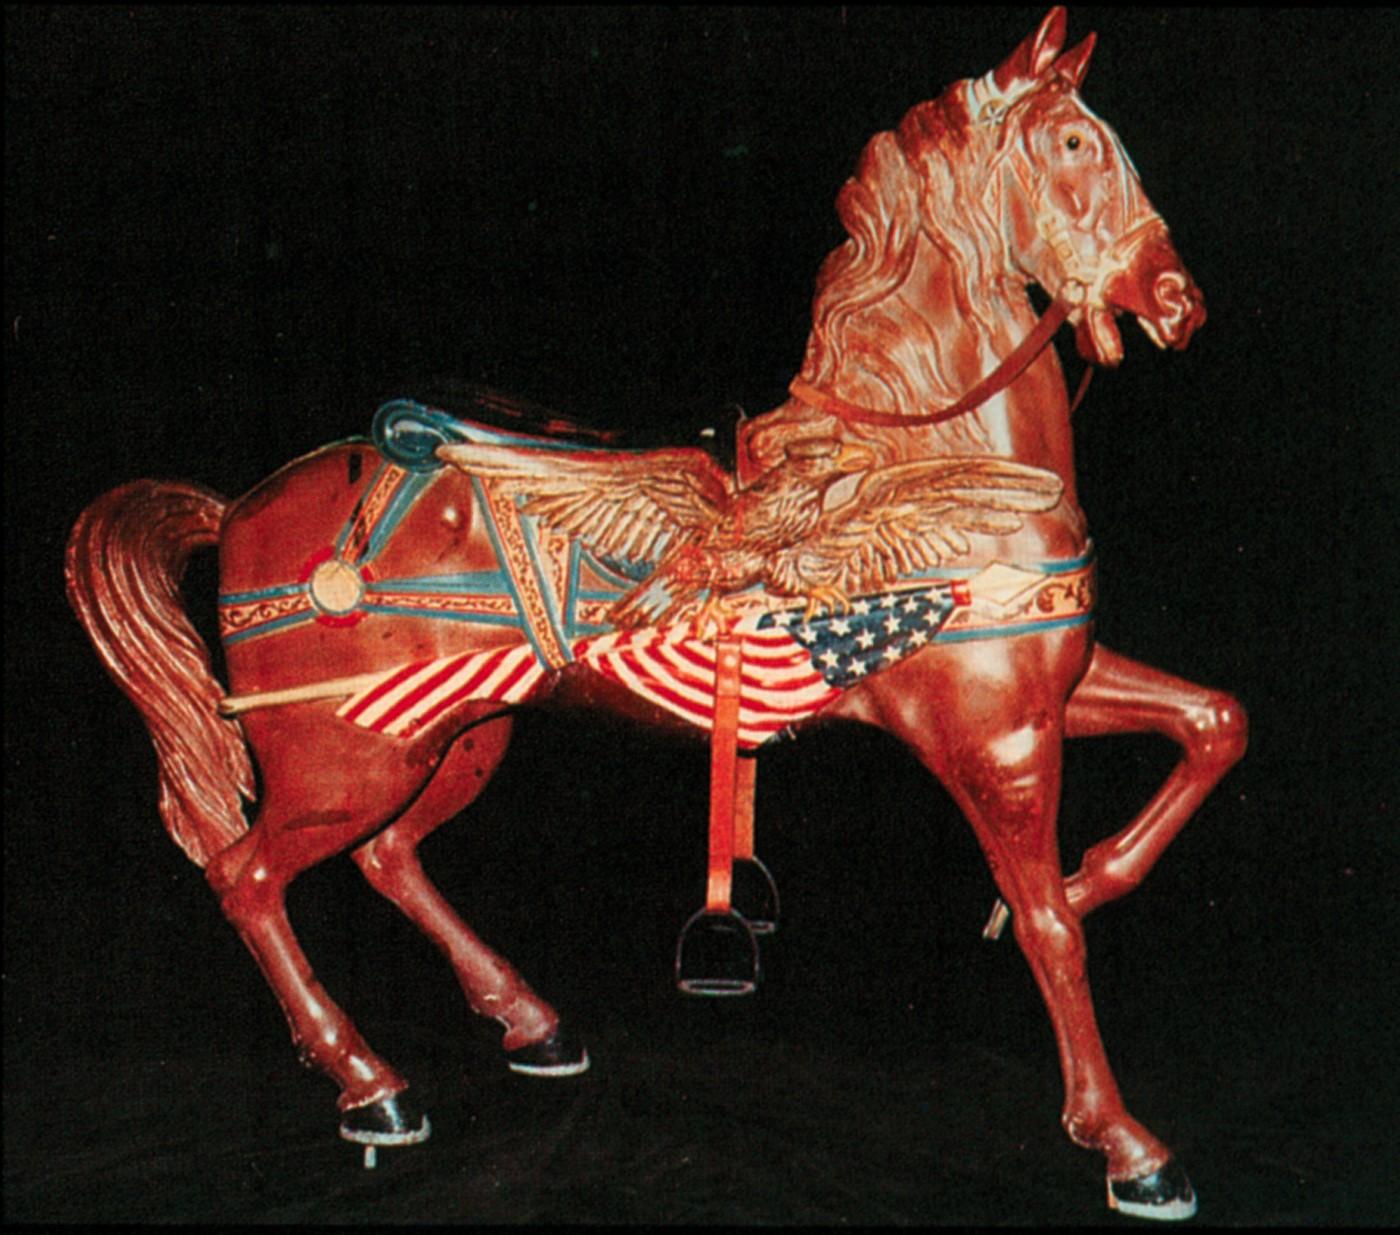 Dentzel-flag-horse-Hurbut-carousel-auction